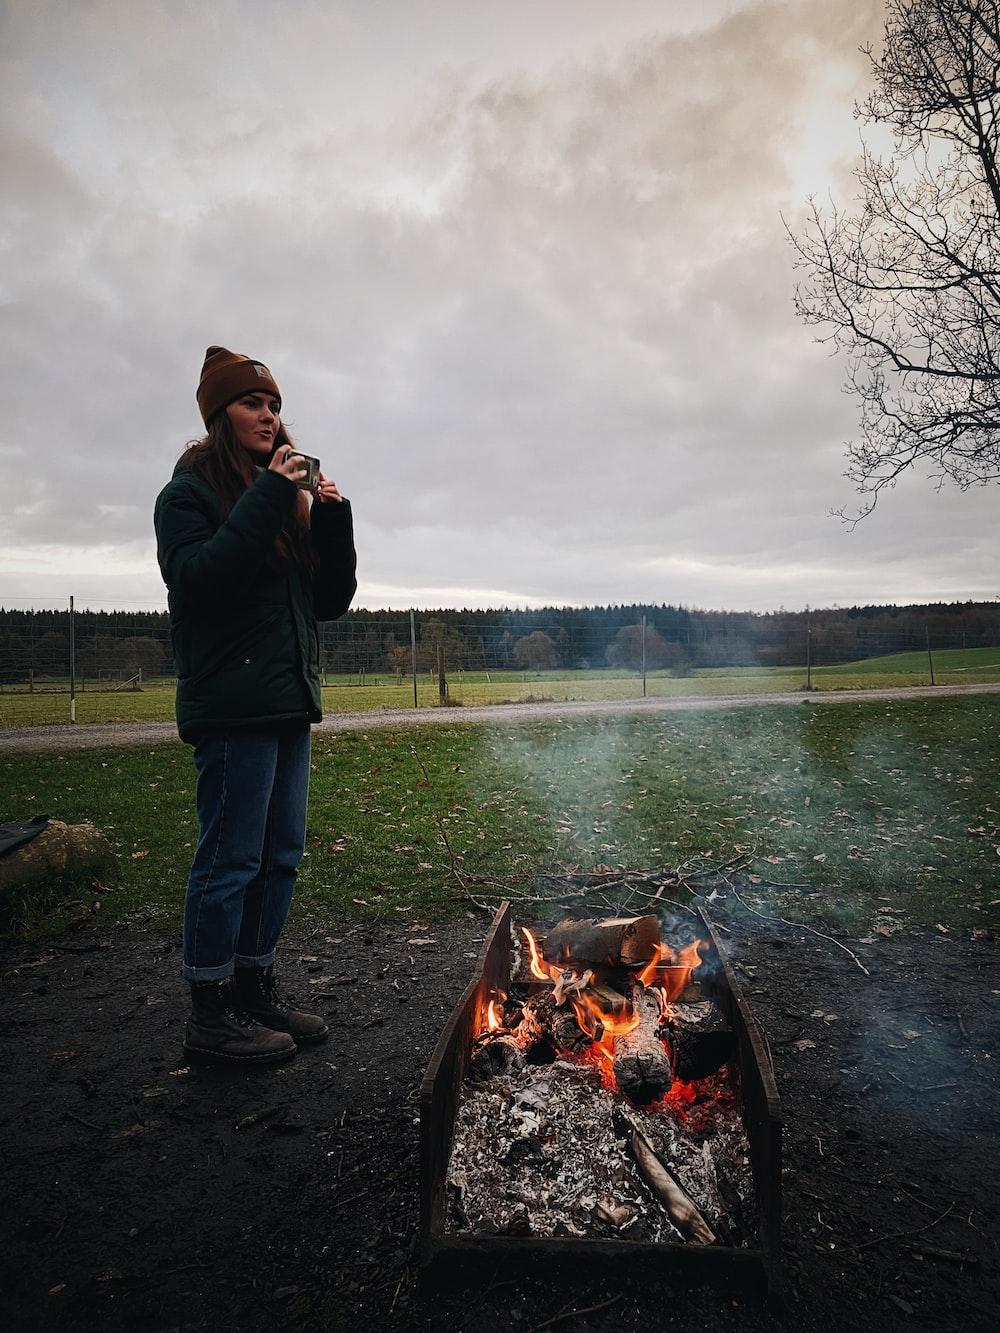 man in black jacket standing near bonfire during daytime